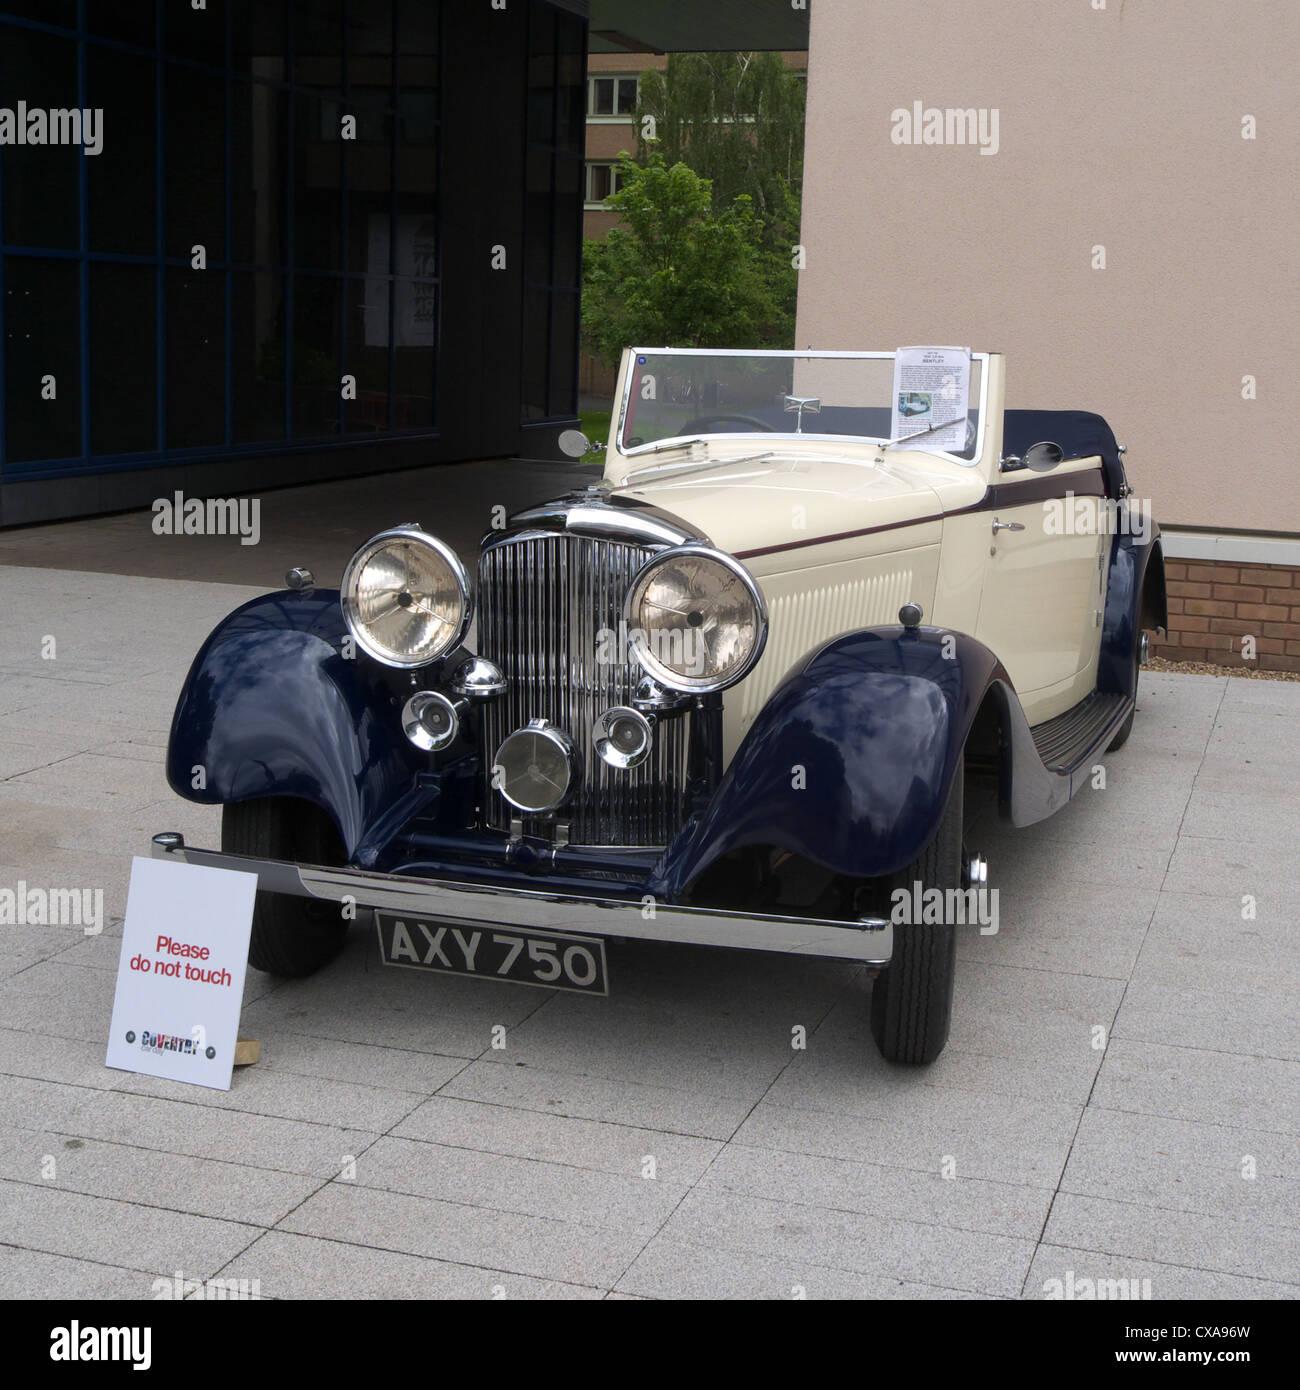 1934 3.5 Litre Bentley Convertible Vintage Luxury Car Stock Photo